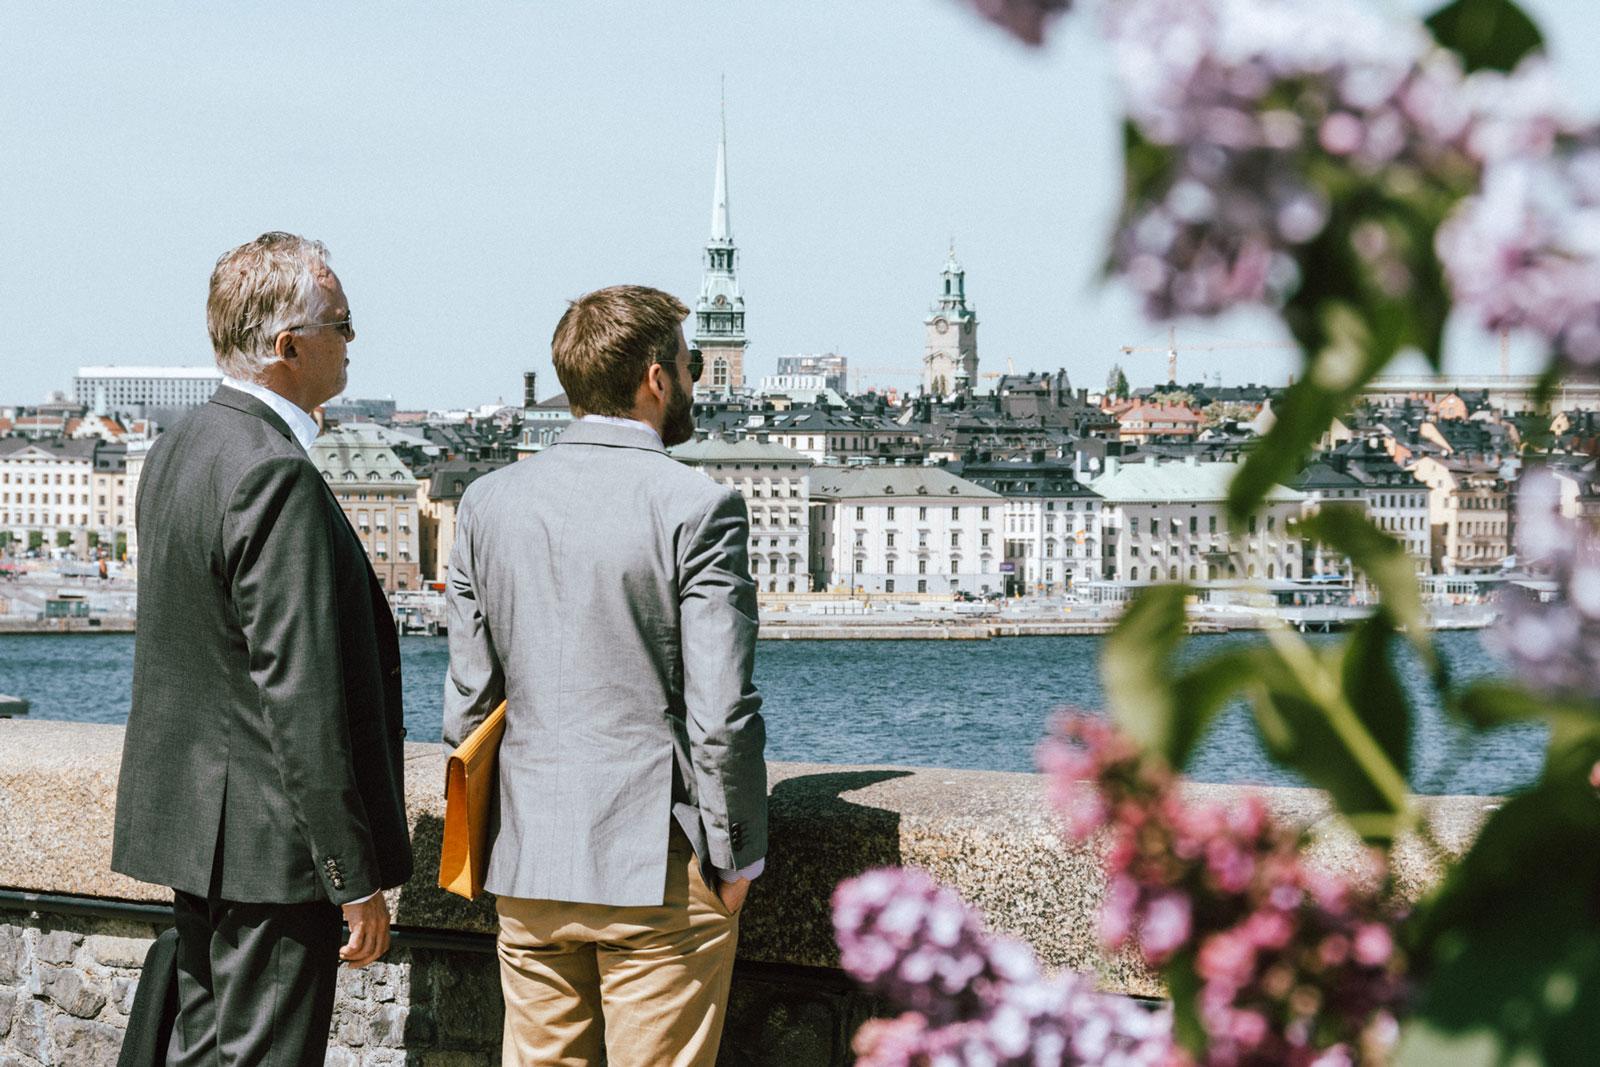 swe-stockholm-06-wp